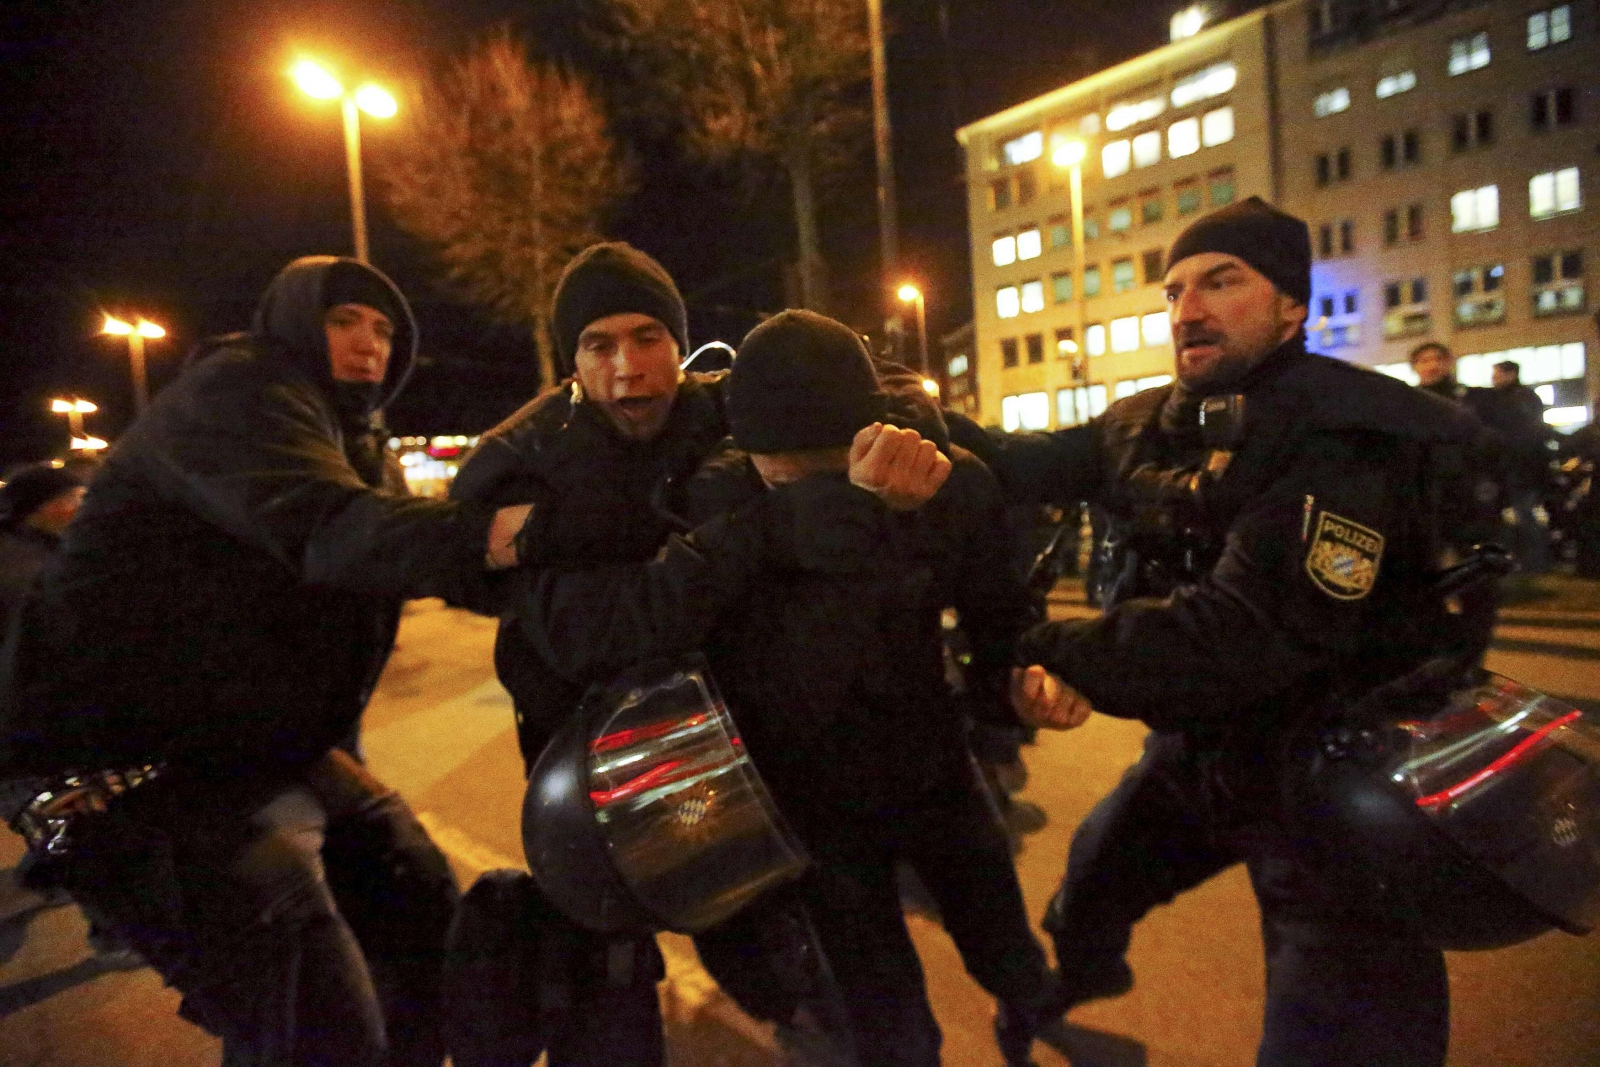 Germany: Anti-Islam Pegida protest rally draws record 25,000 in Dresden